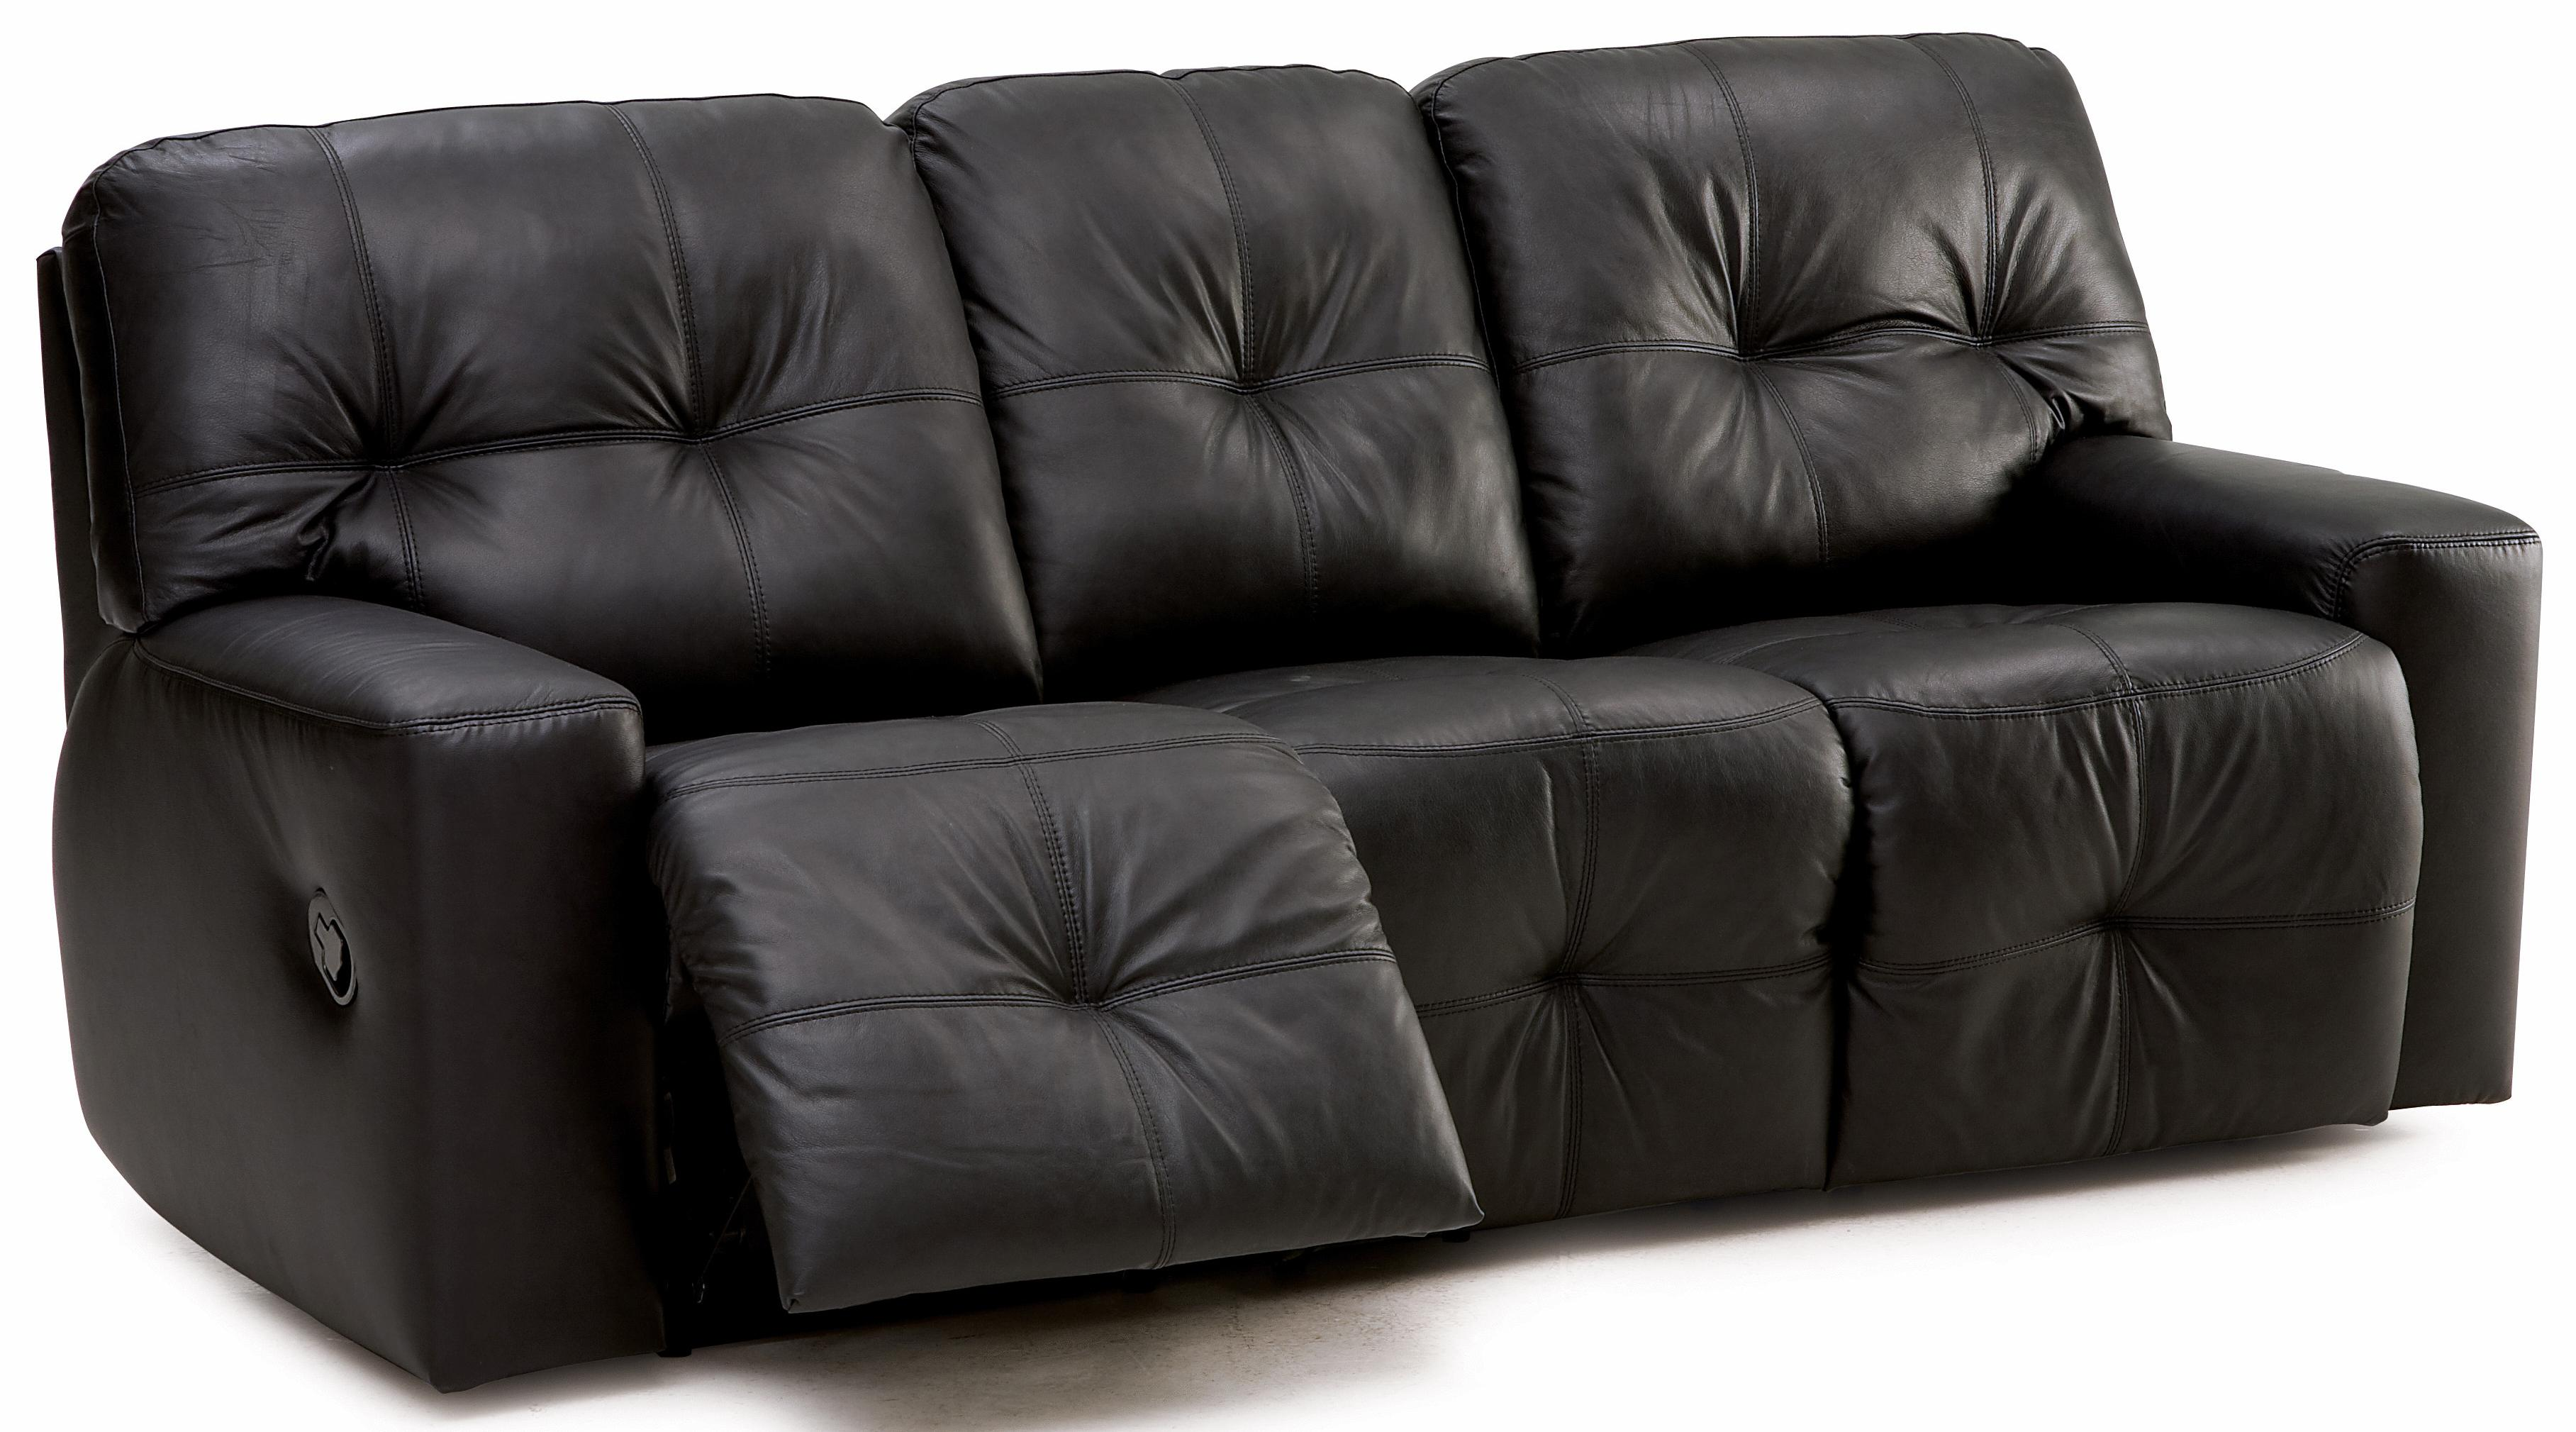 Palliser Mystique Power Sofa Recliner - Item Number: 41042-61